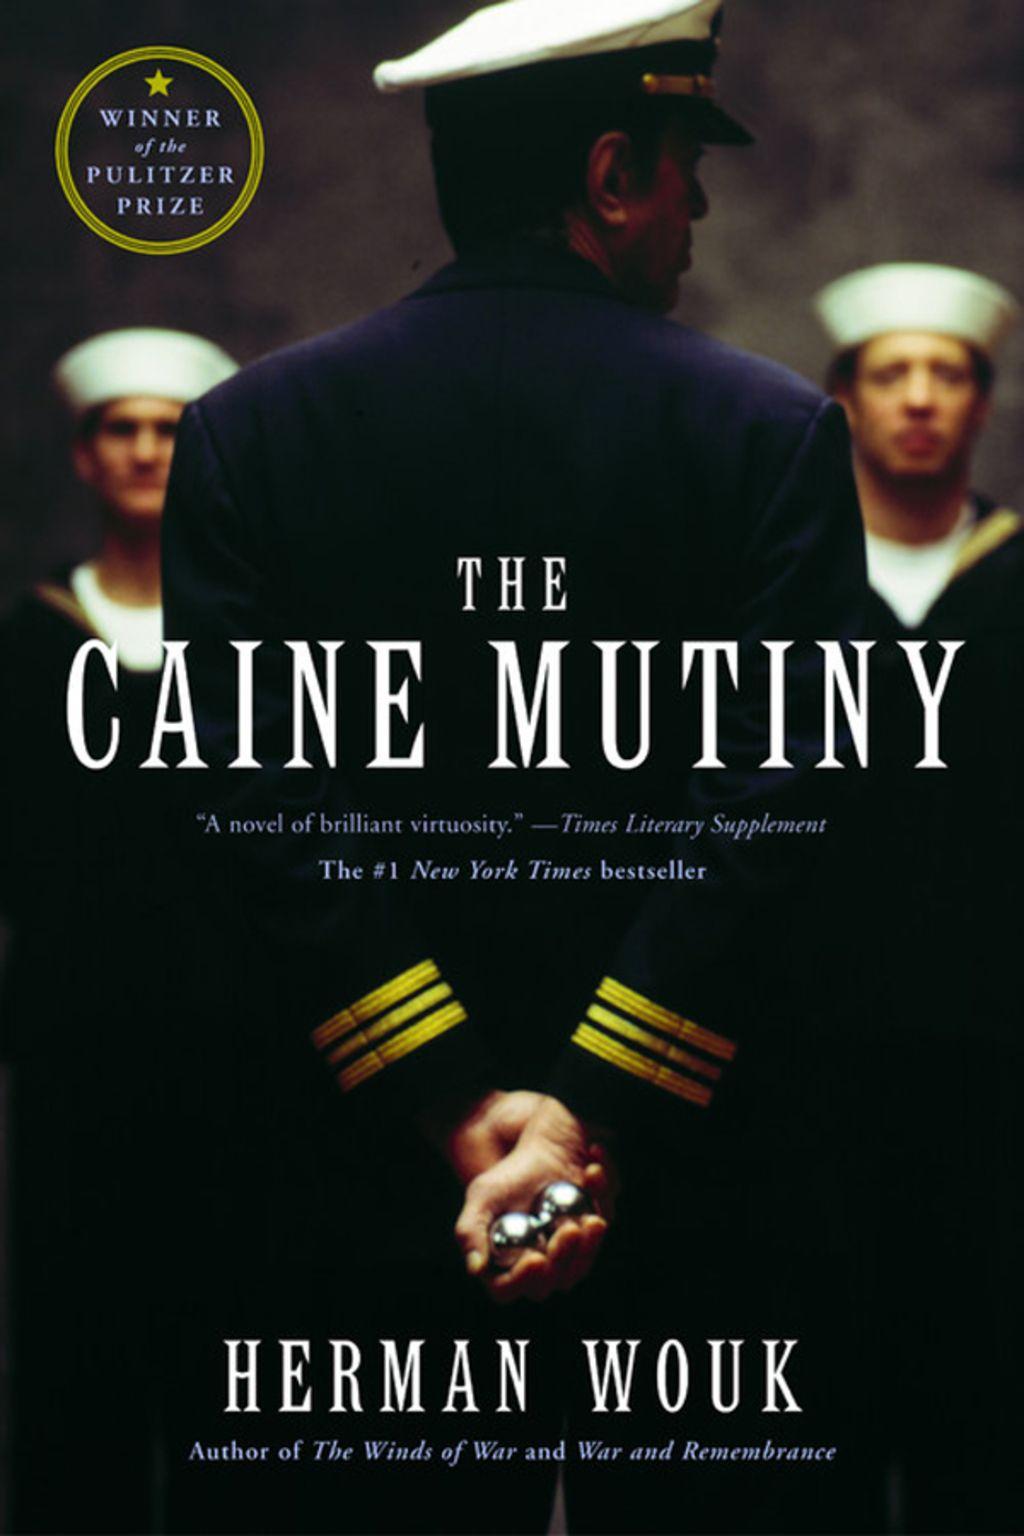 The Caine Mutiny Ebook The Caine Mutiny Novels Mutiny